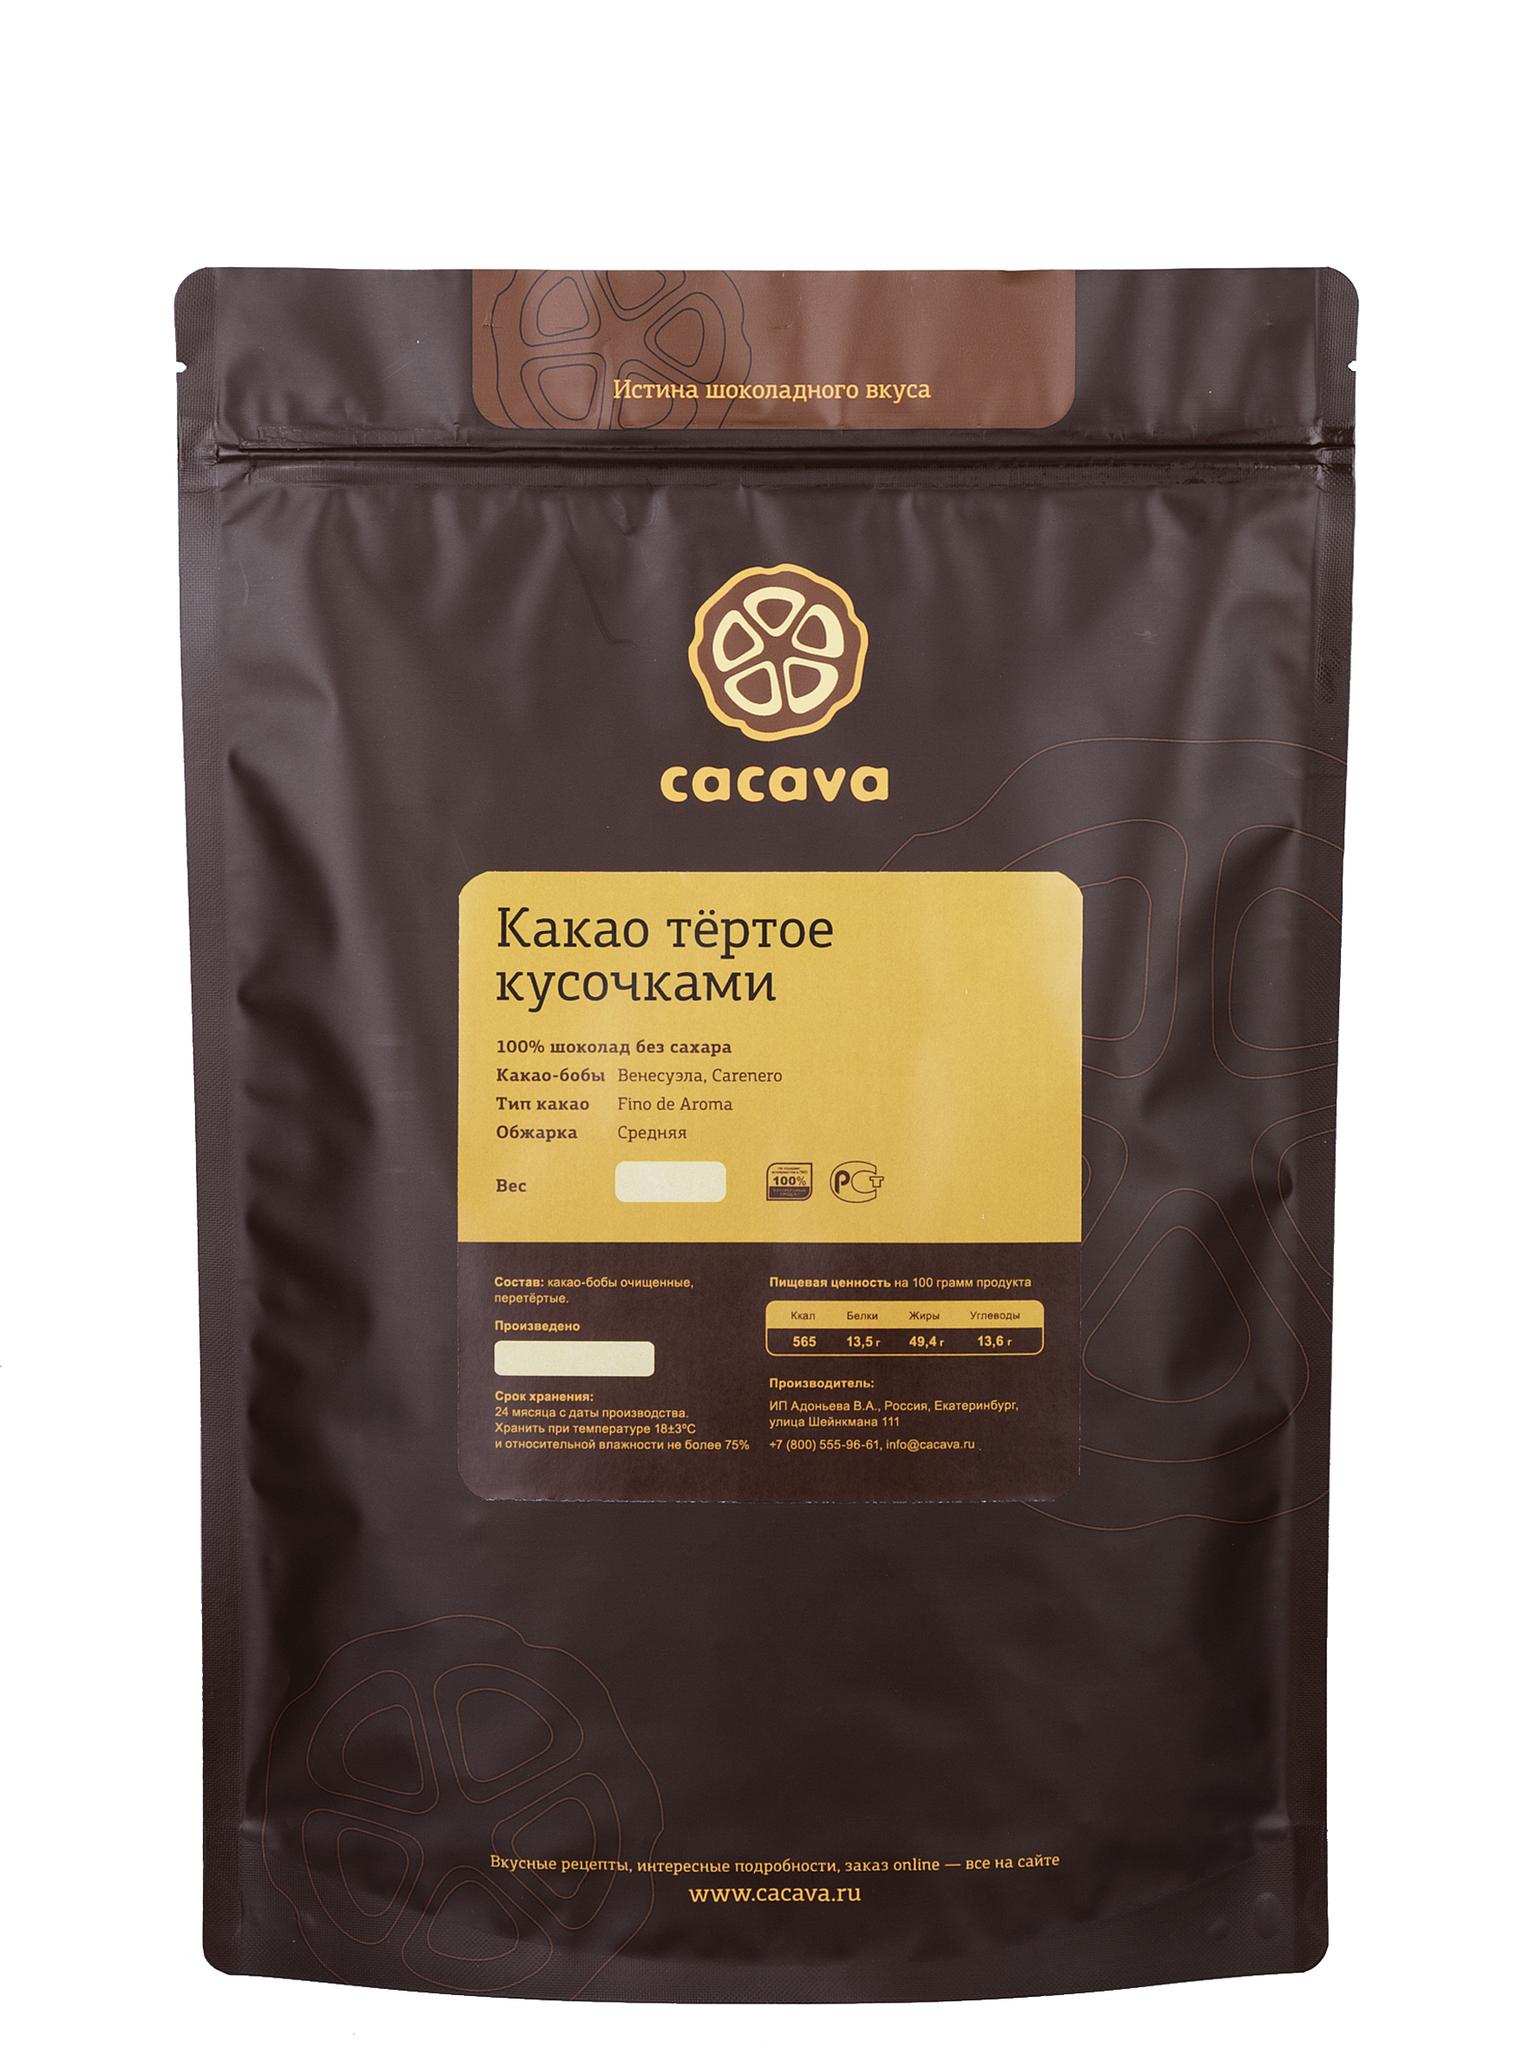 Какао тёртое кусочками (Венесуэла), упаковка 1 и 3 кг